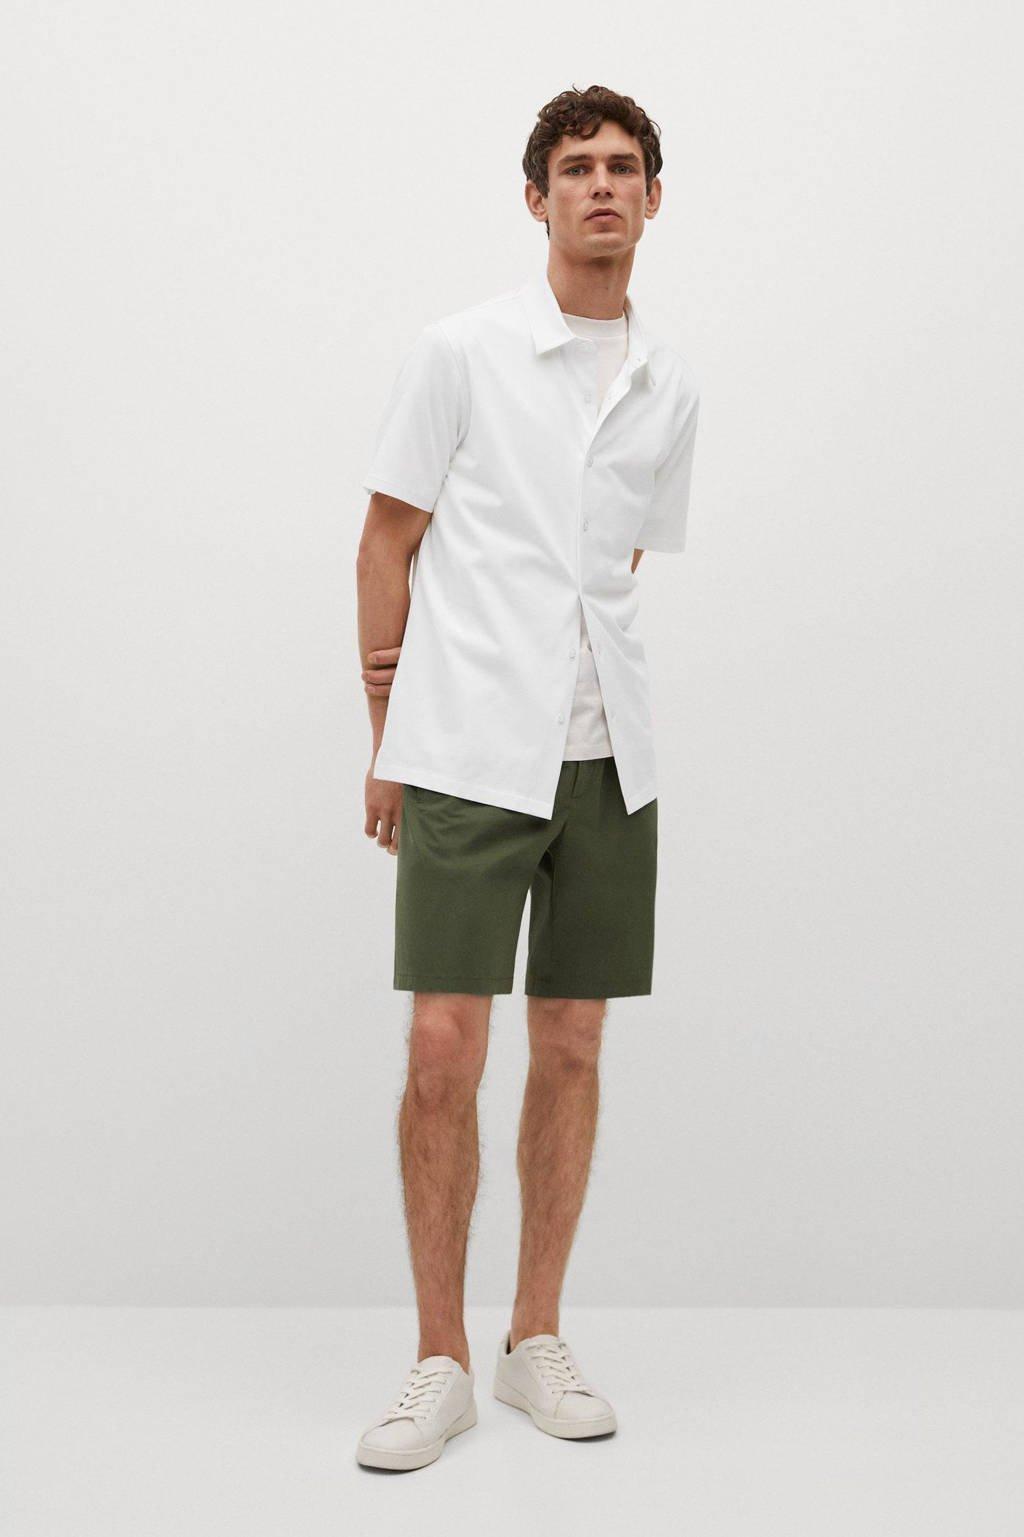 Mango Man regular fit overhemd wit, naturel wit